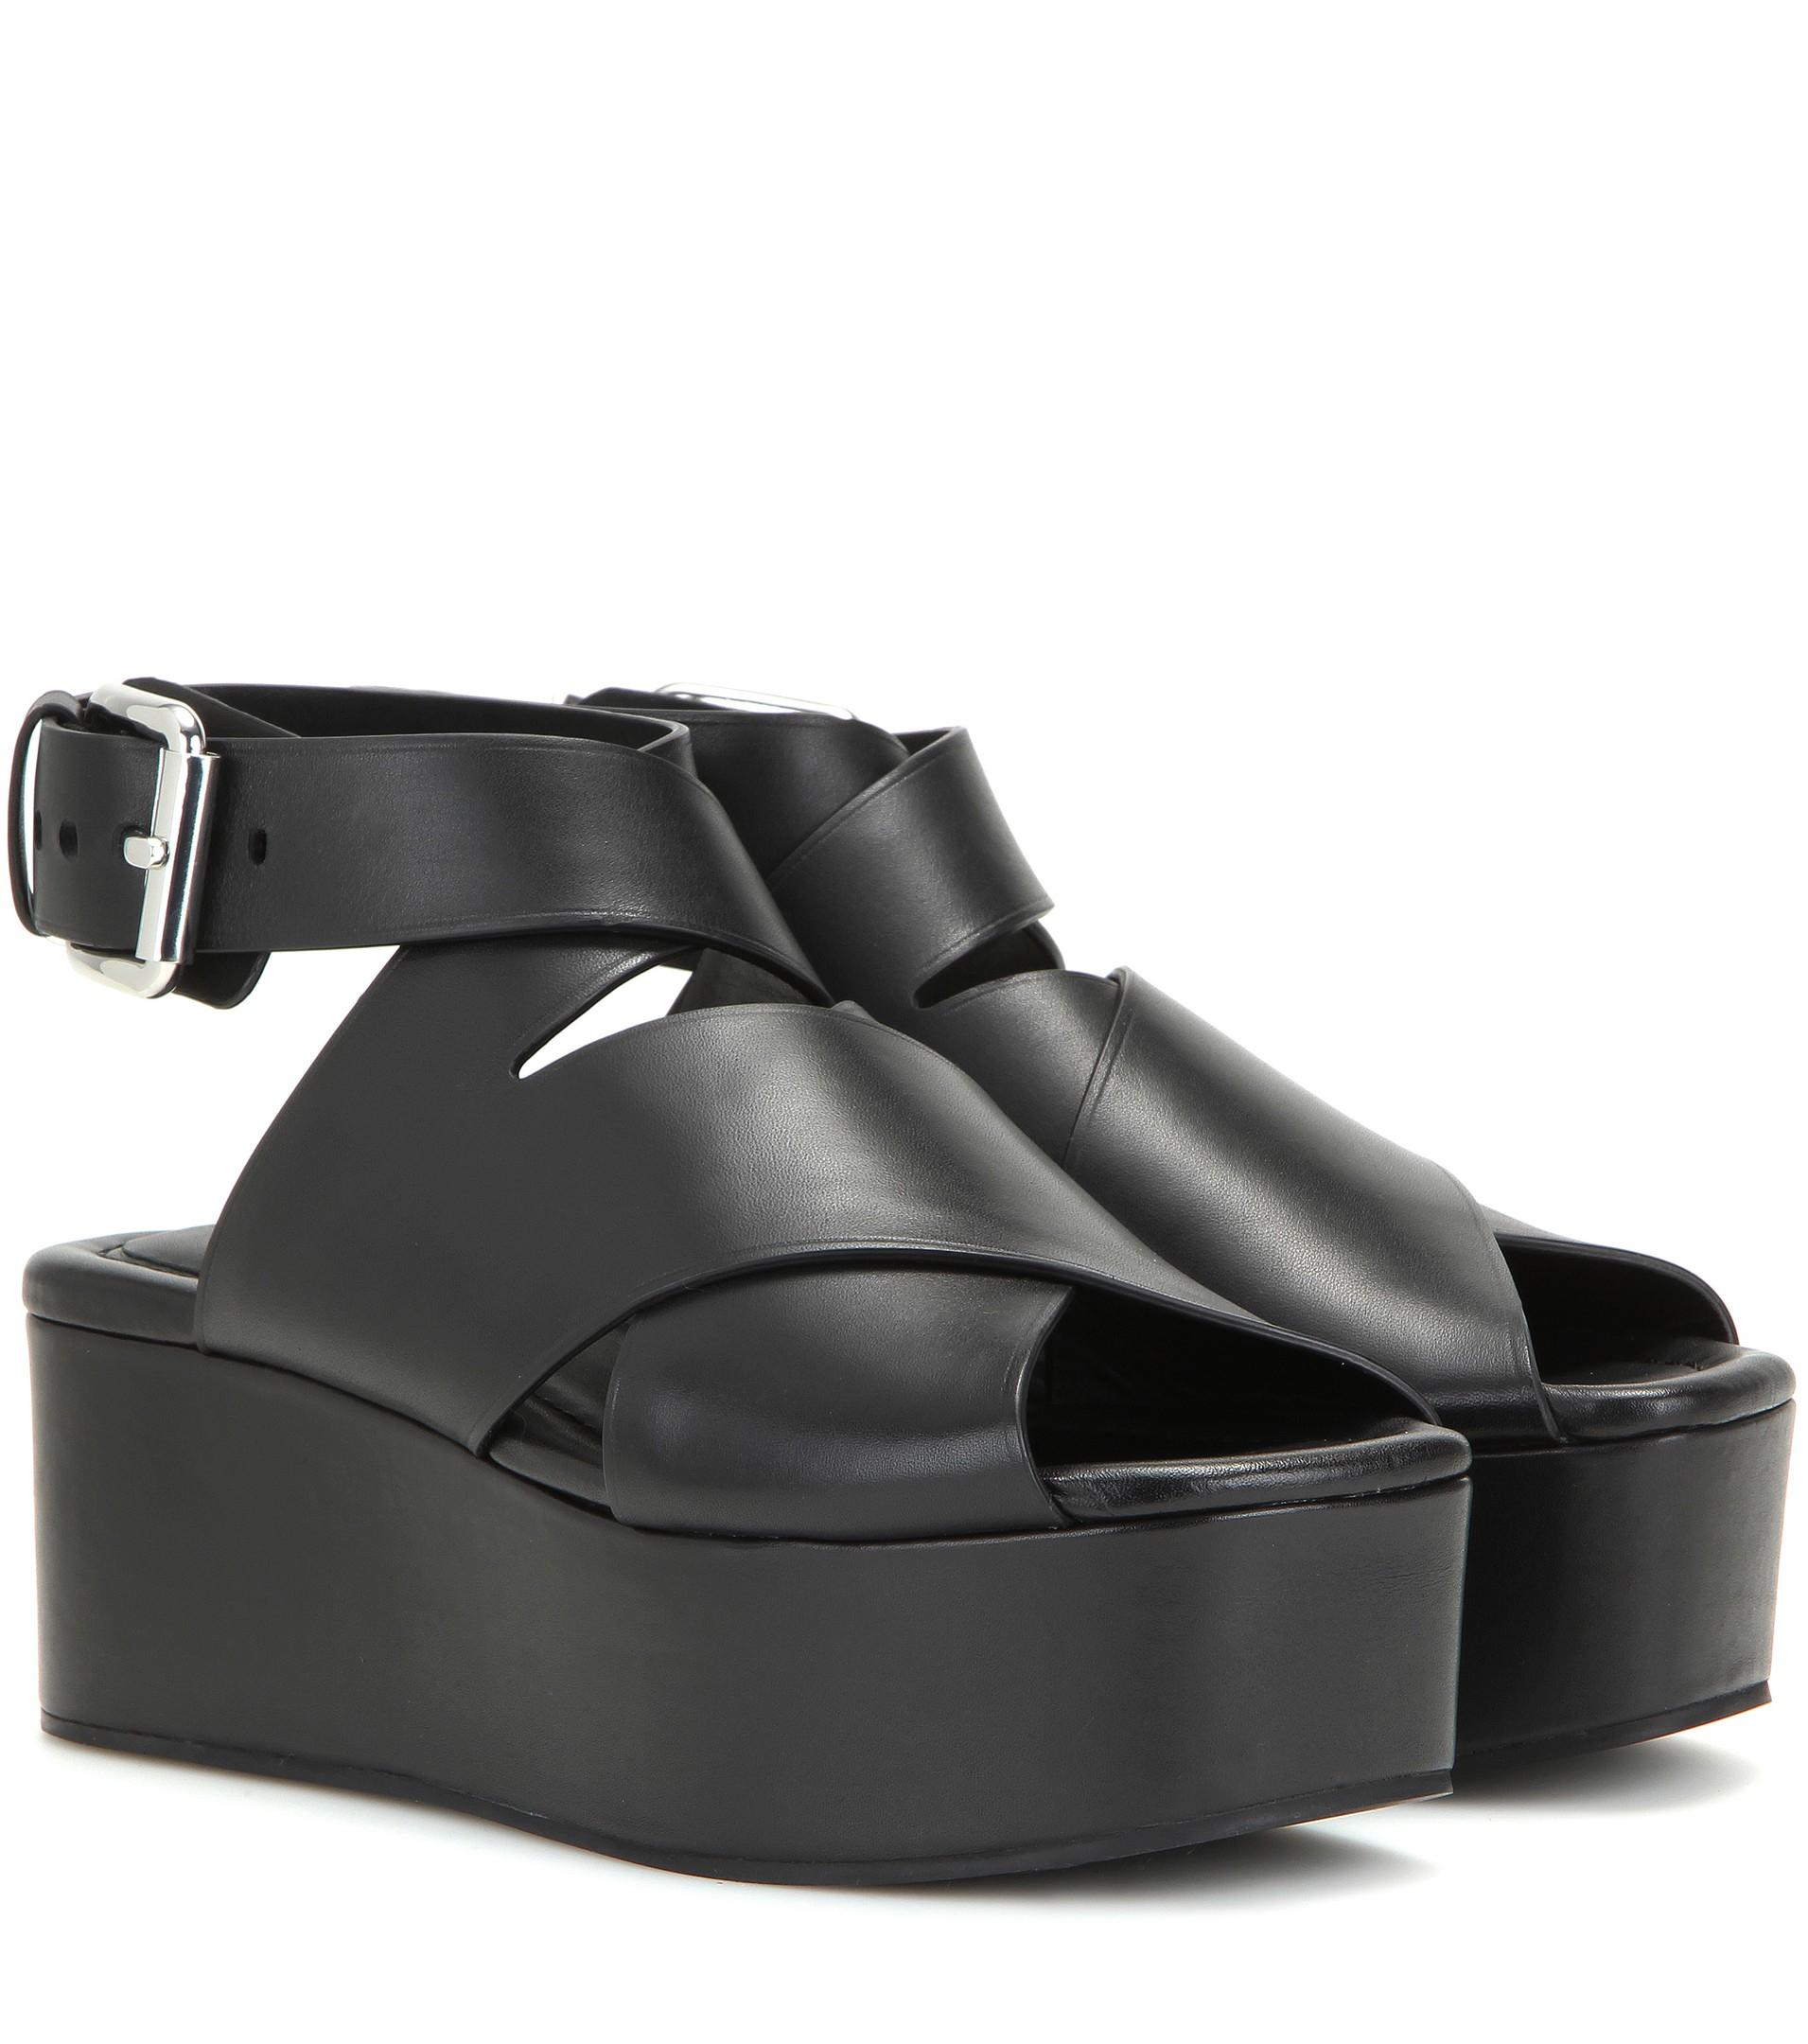 Lyst - Alexander Wang Rudy Leather Platform Sandals in Black